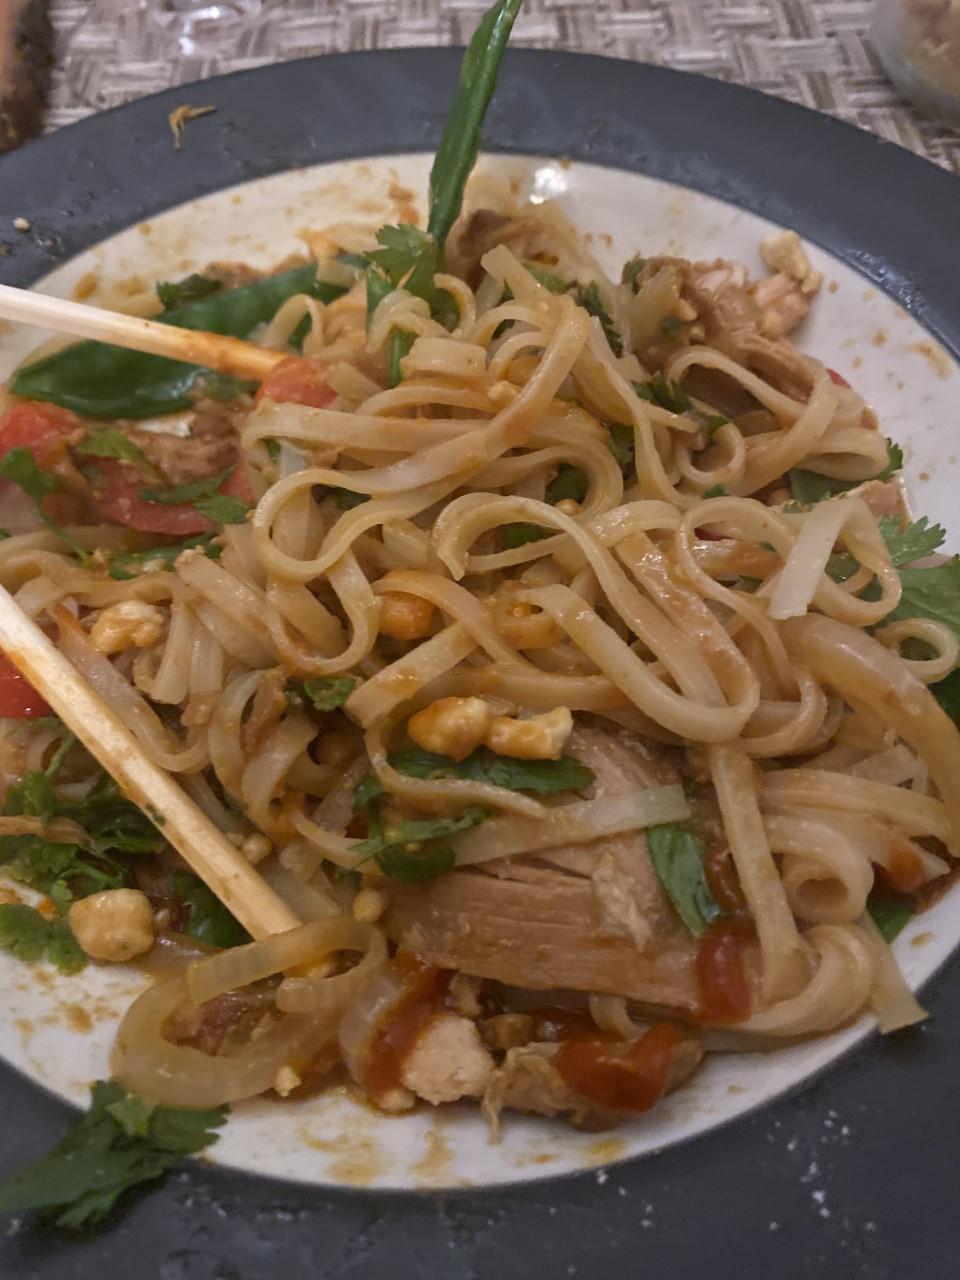 Frank's Favorite Slow-Cooker Thai Chicken AprilKay